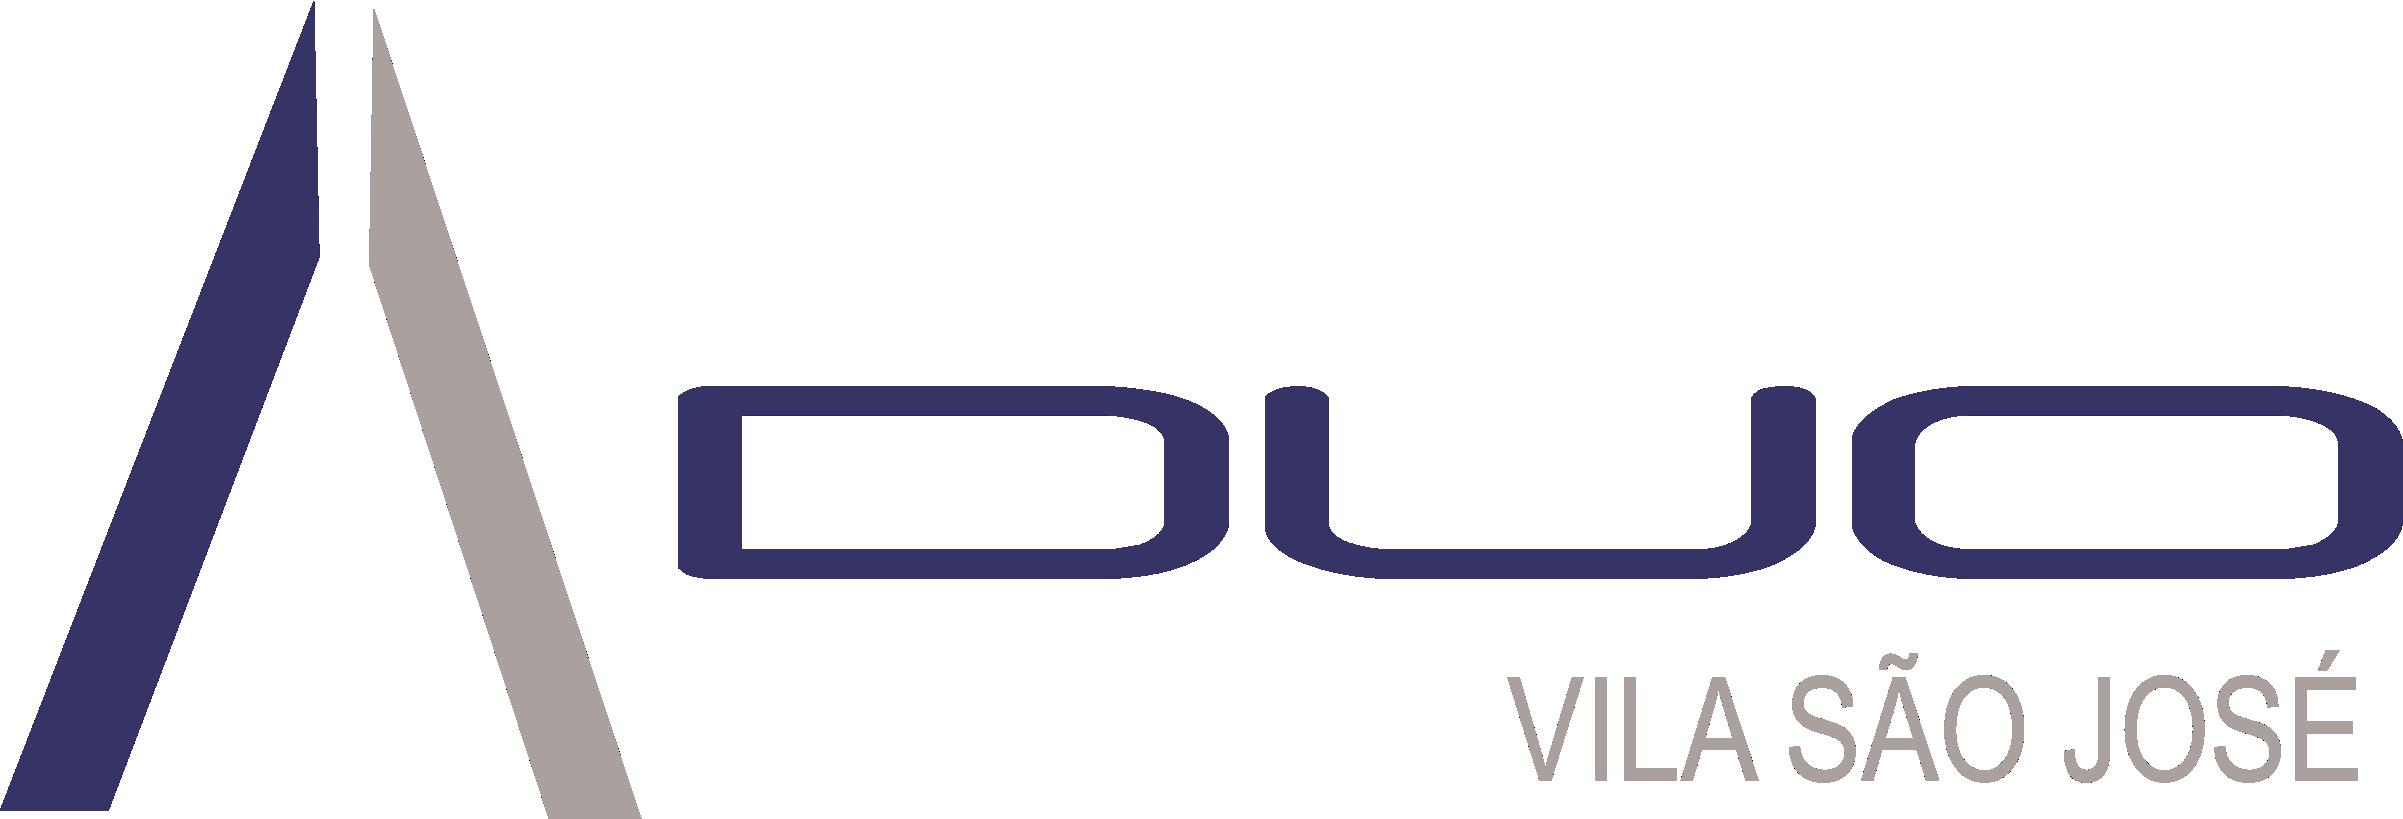 logo_duo_aprovada_corelx5